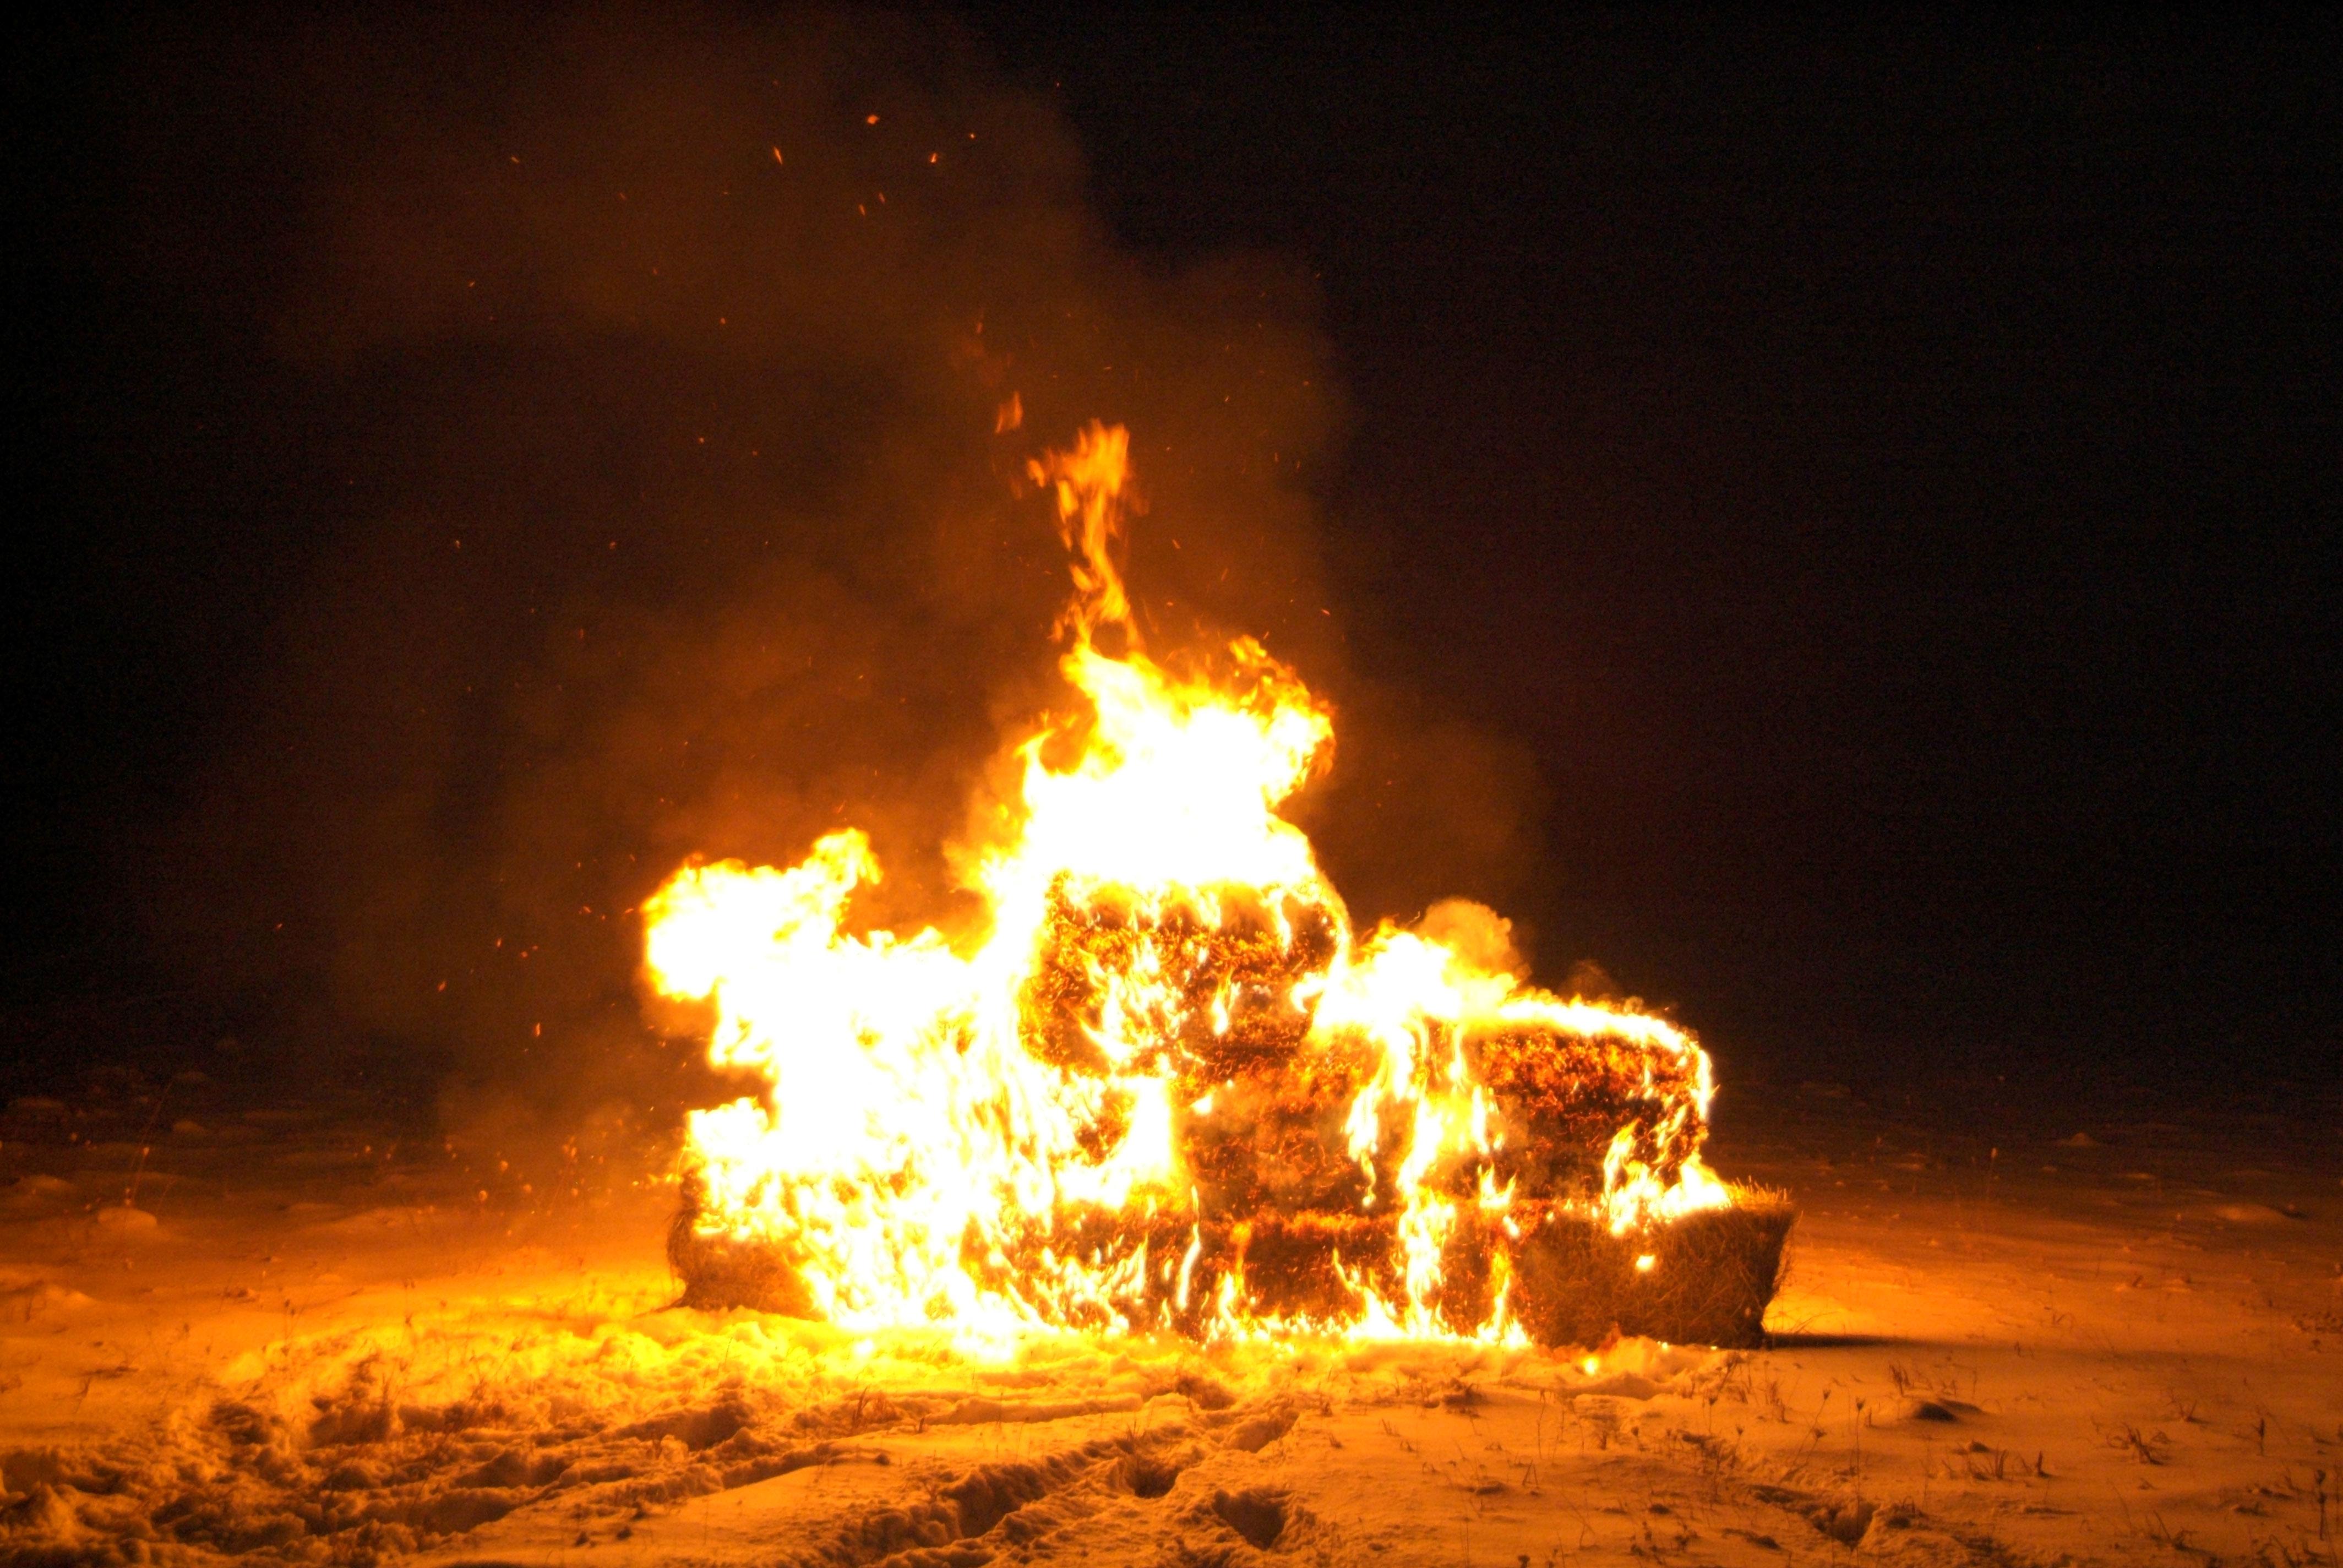 Fire By Mjranum-stock On DeviantArt